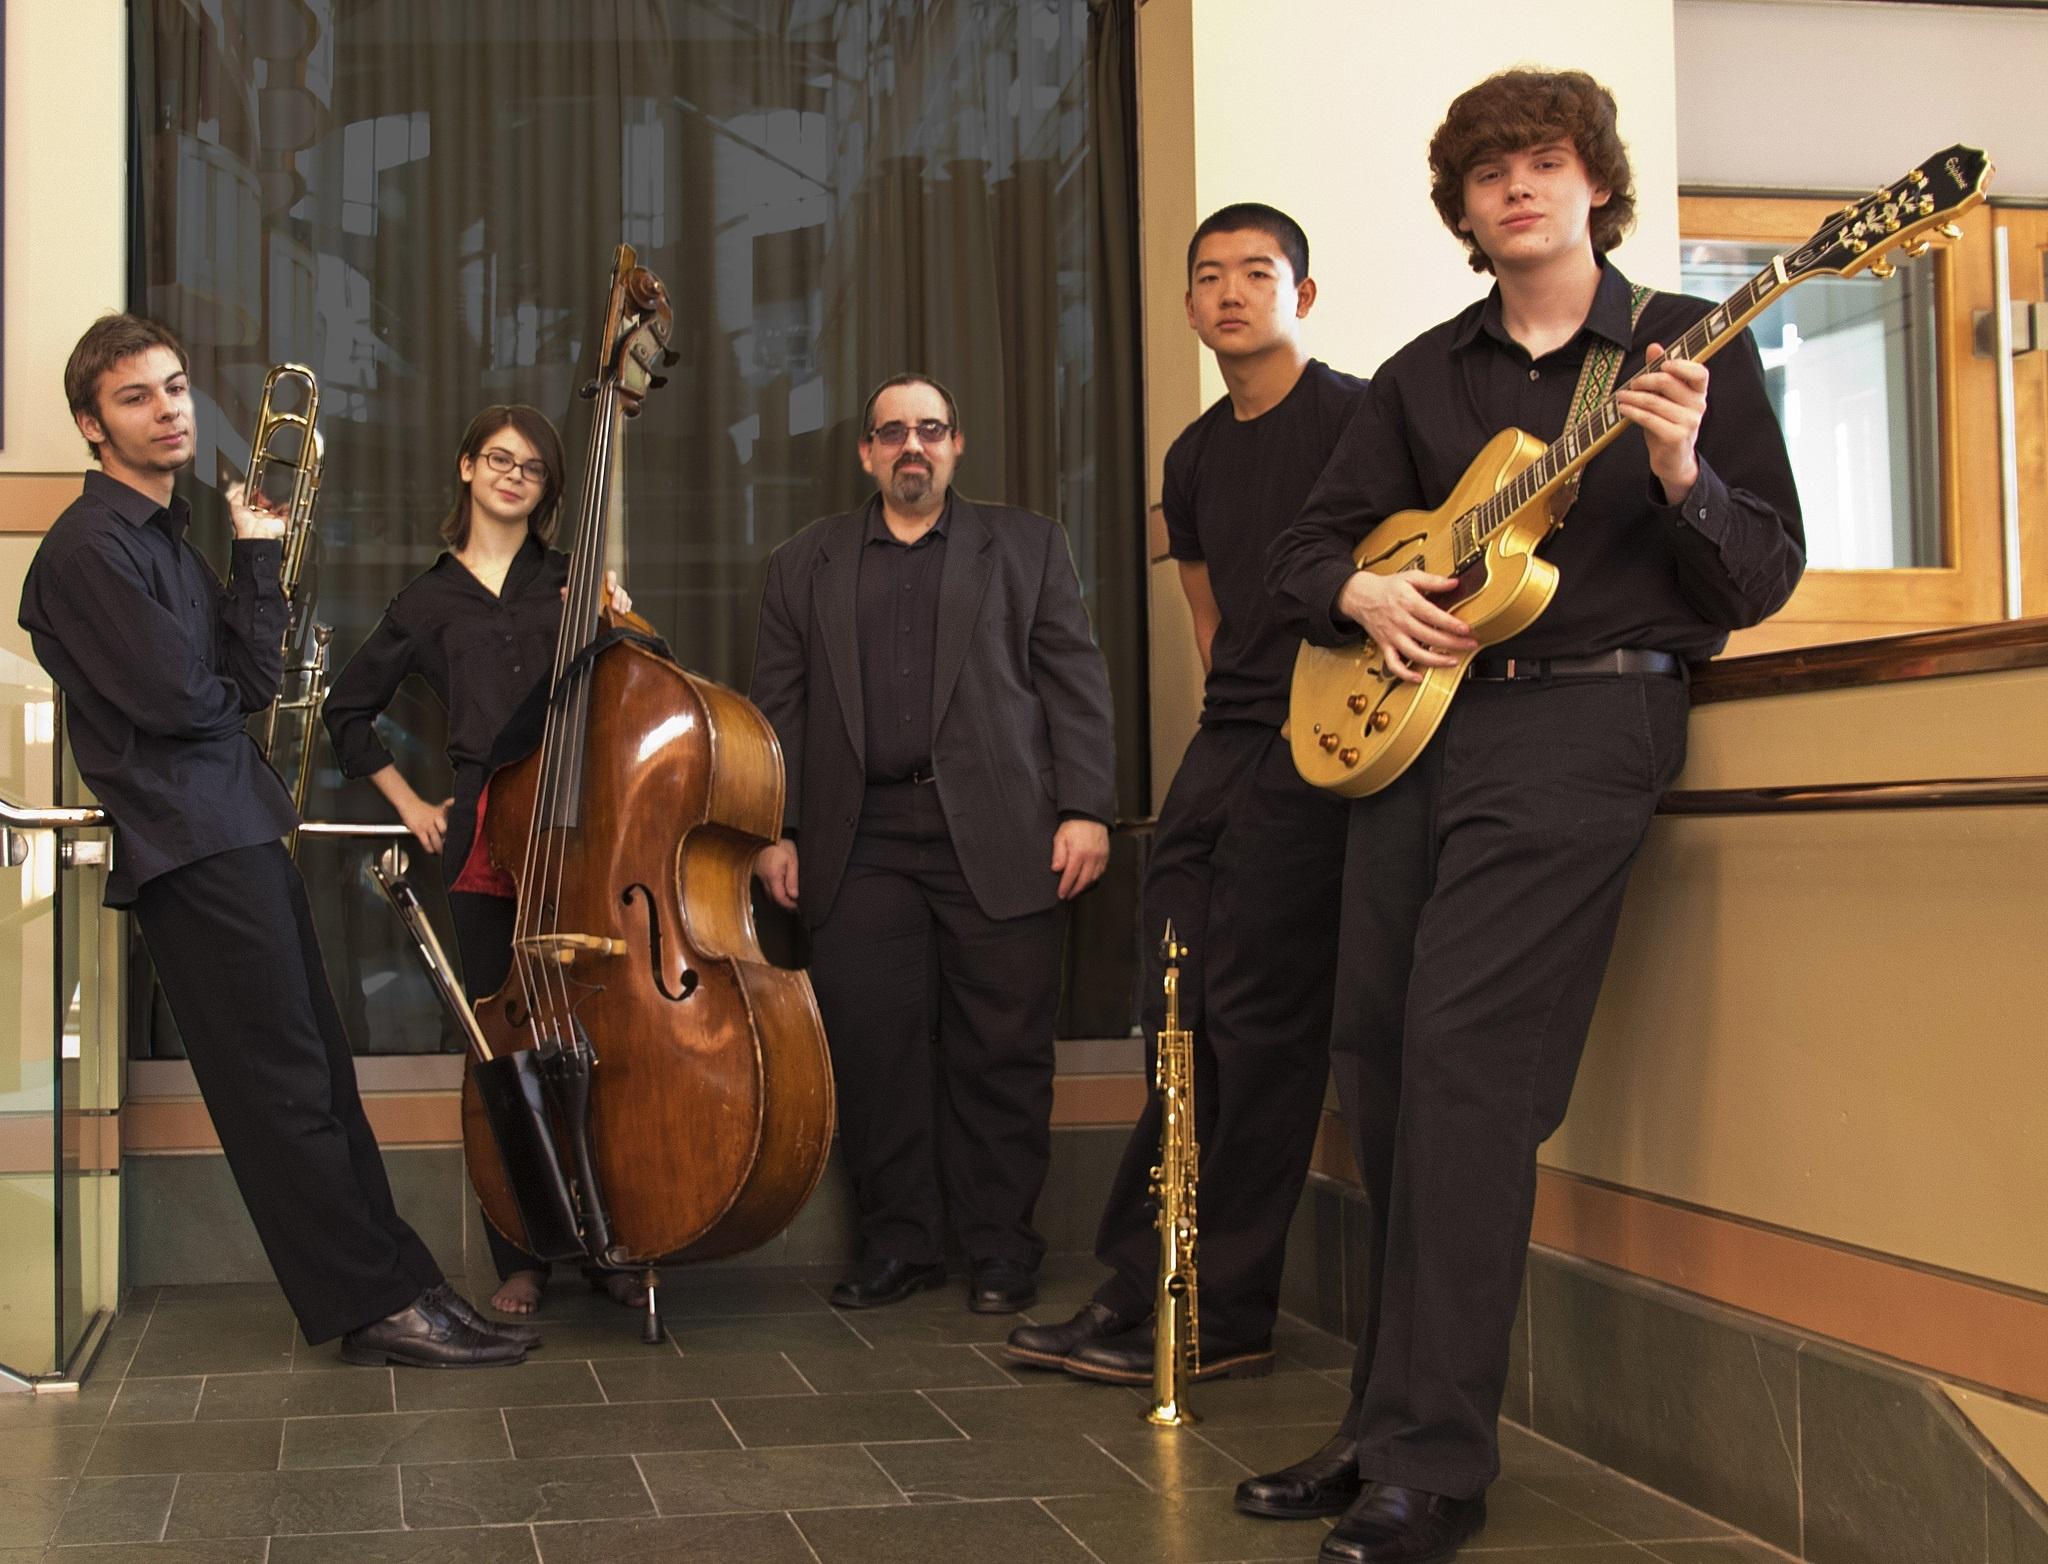 8d6abcf2d0a6c4faf732_Dave_Schumacher_and_NJYS_Jazz_Program_Students.jpg